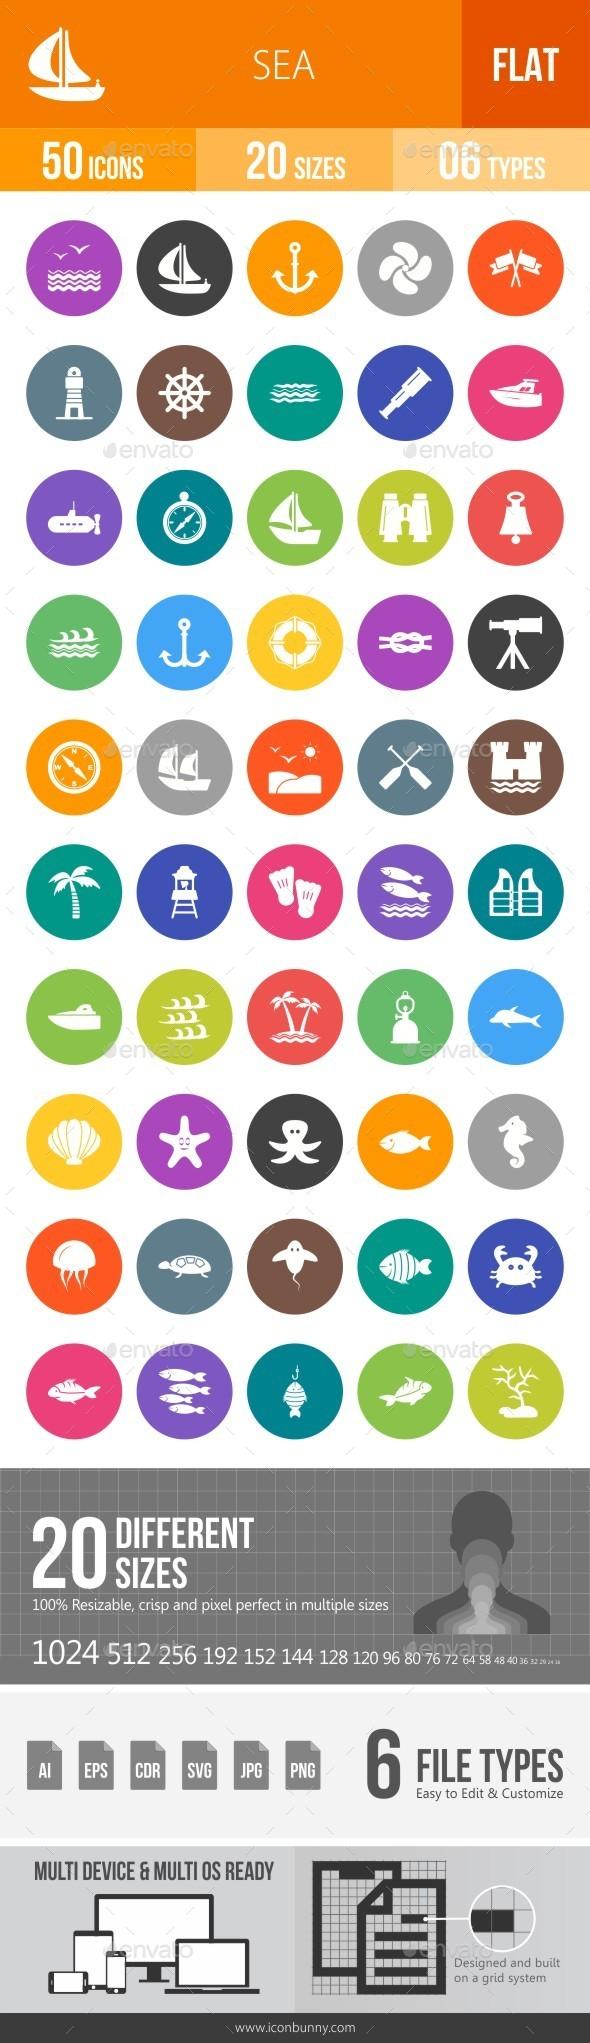 Sea Flat Round Icons - Icons